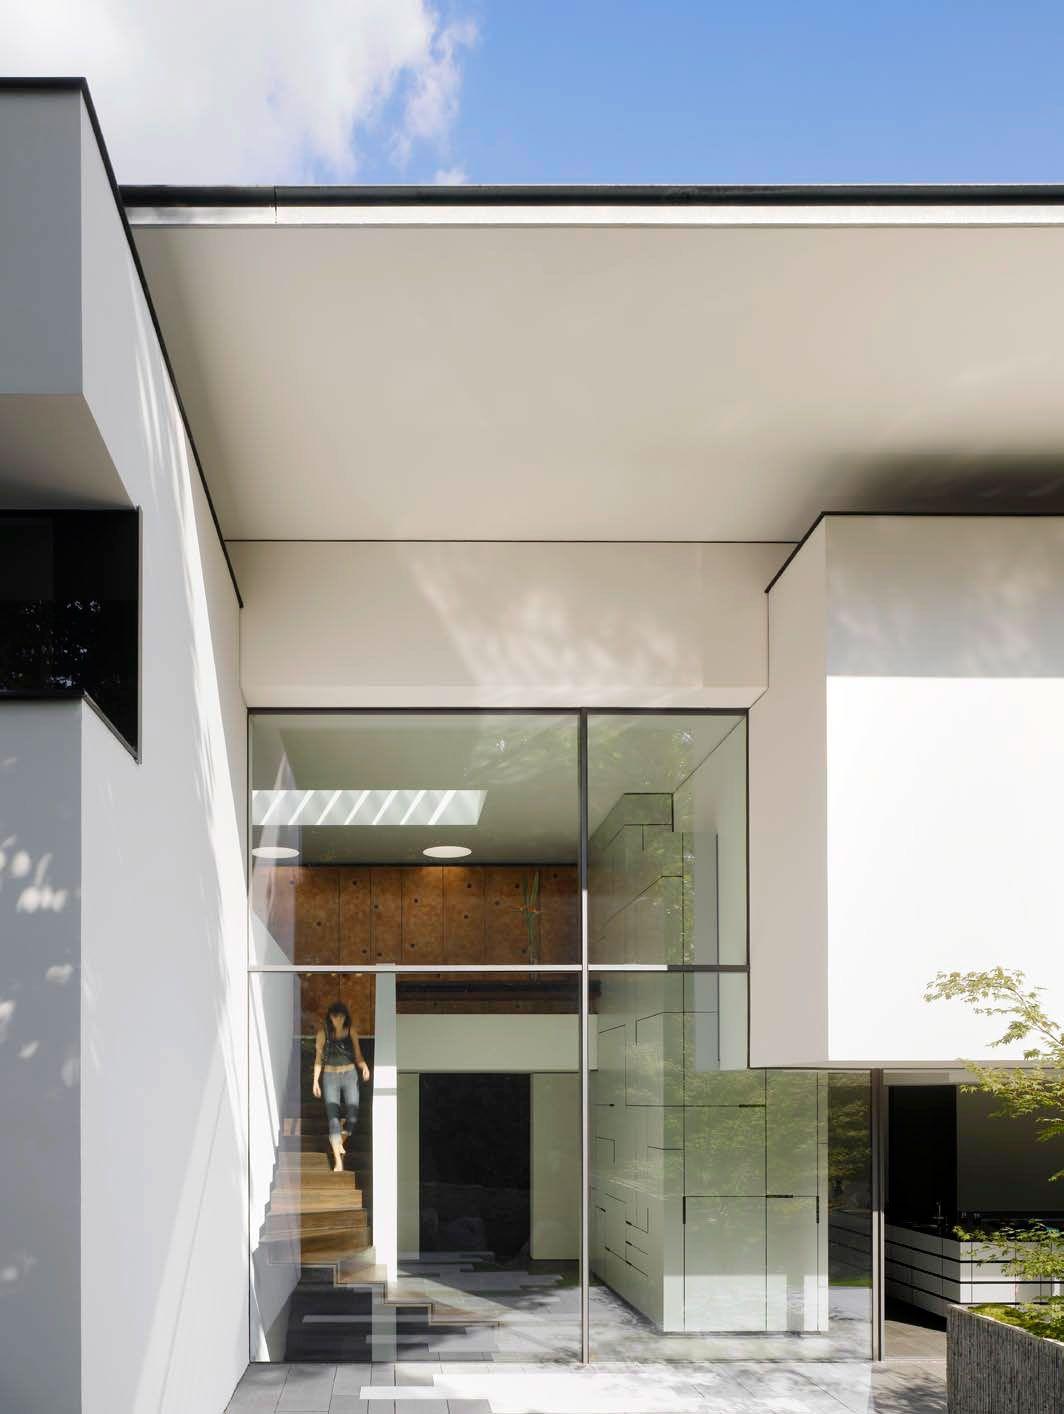 House-Heidehof-08-1